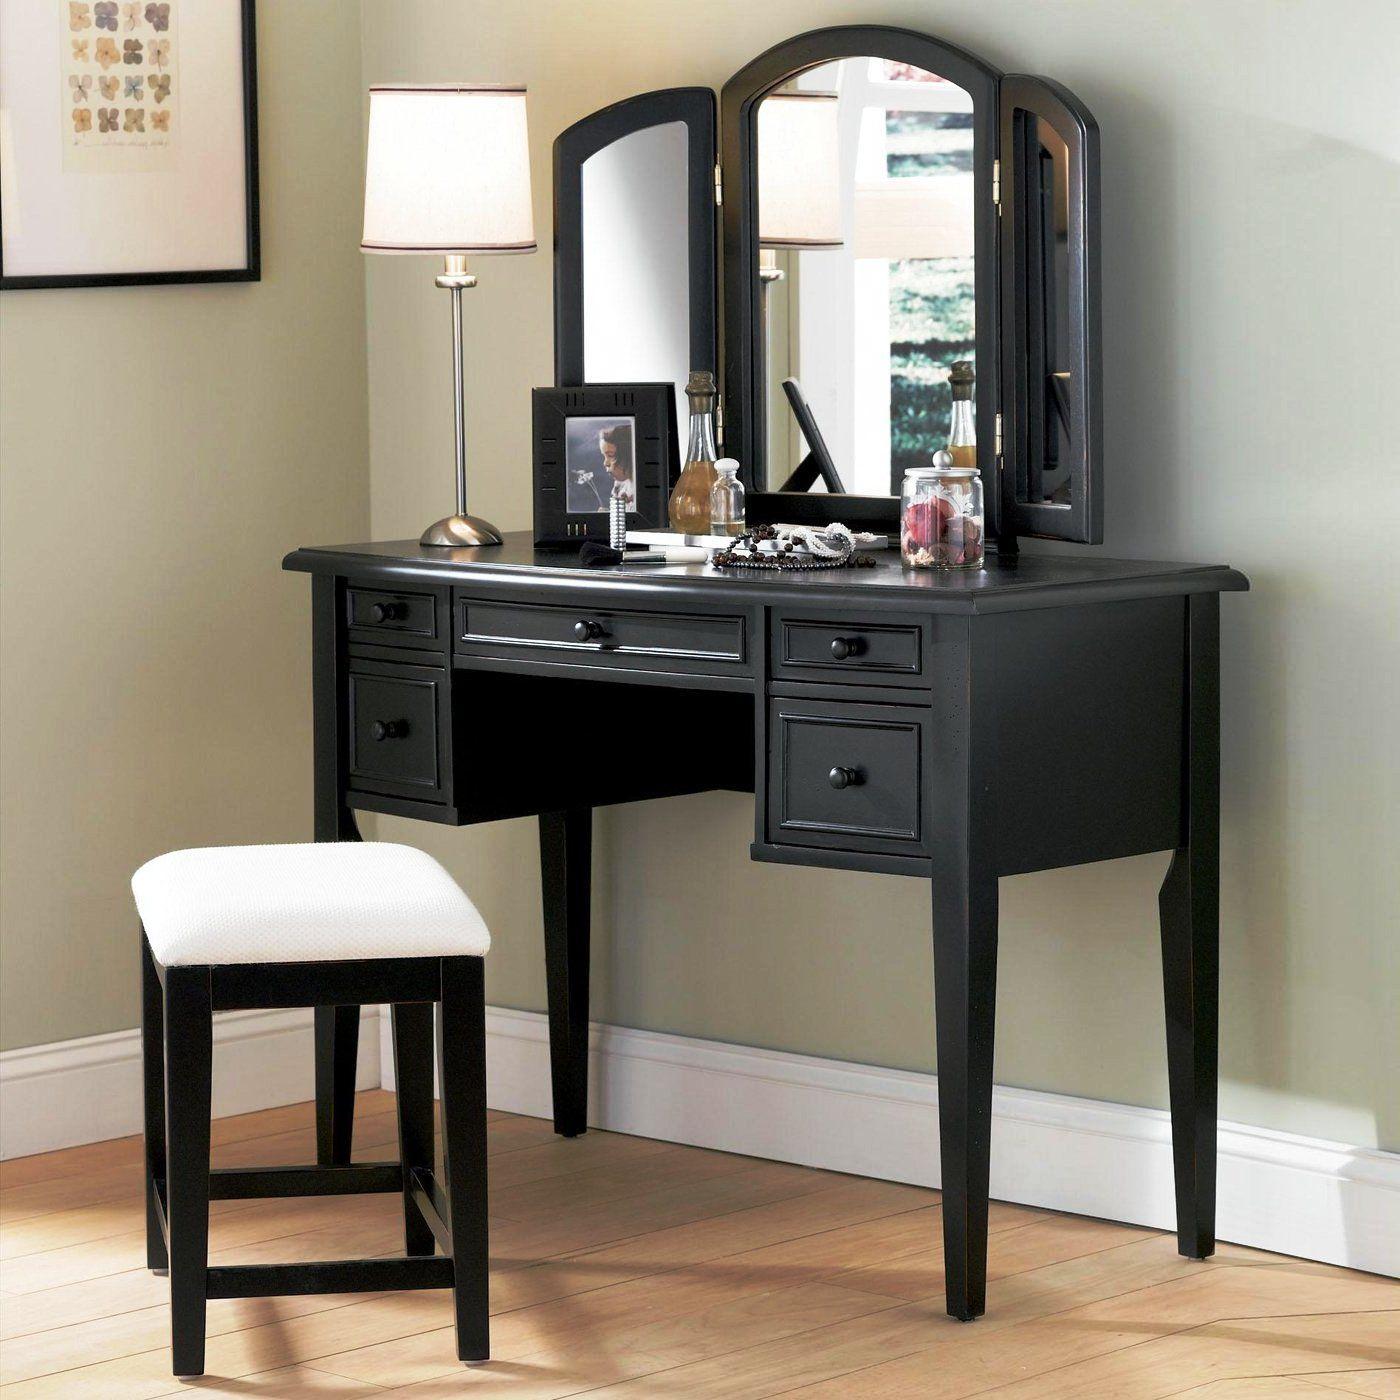 Mirror For Bedroom Bedroom Bathroom Furniture Black Solid Wooden Vanity Make Up Table